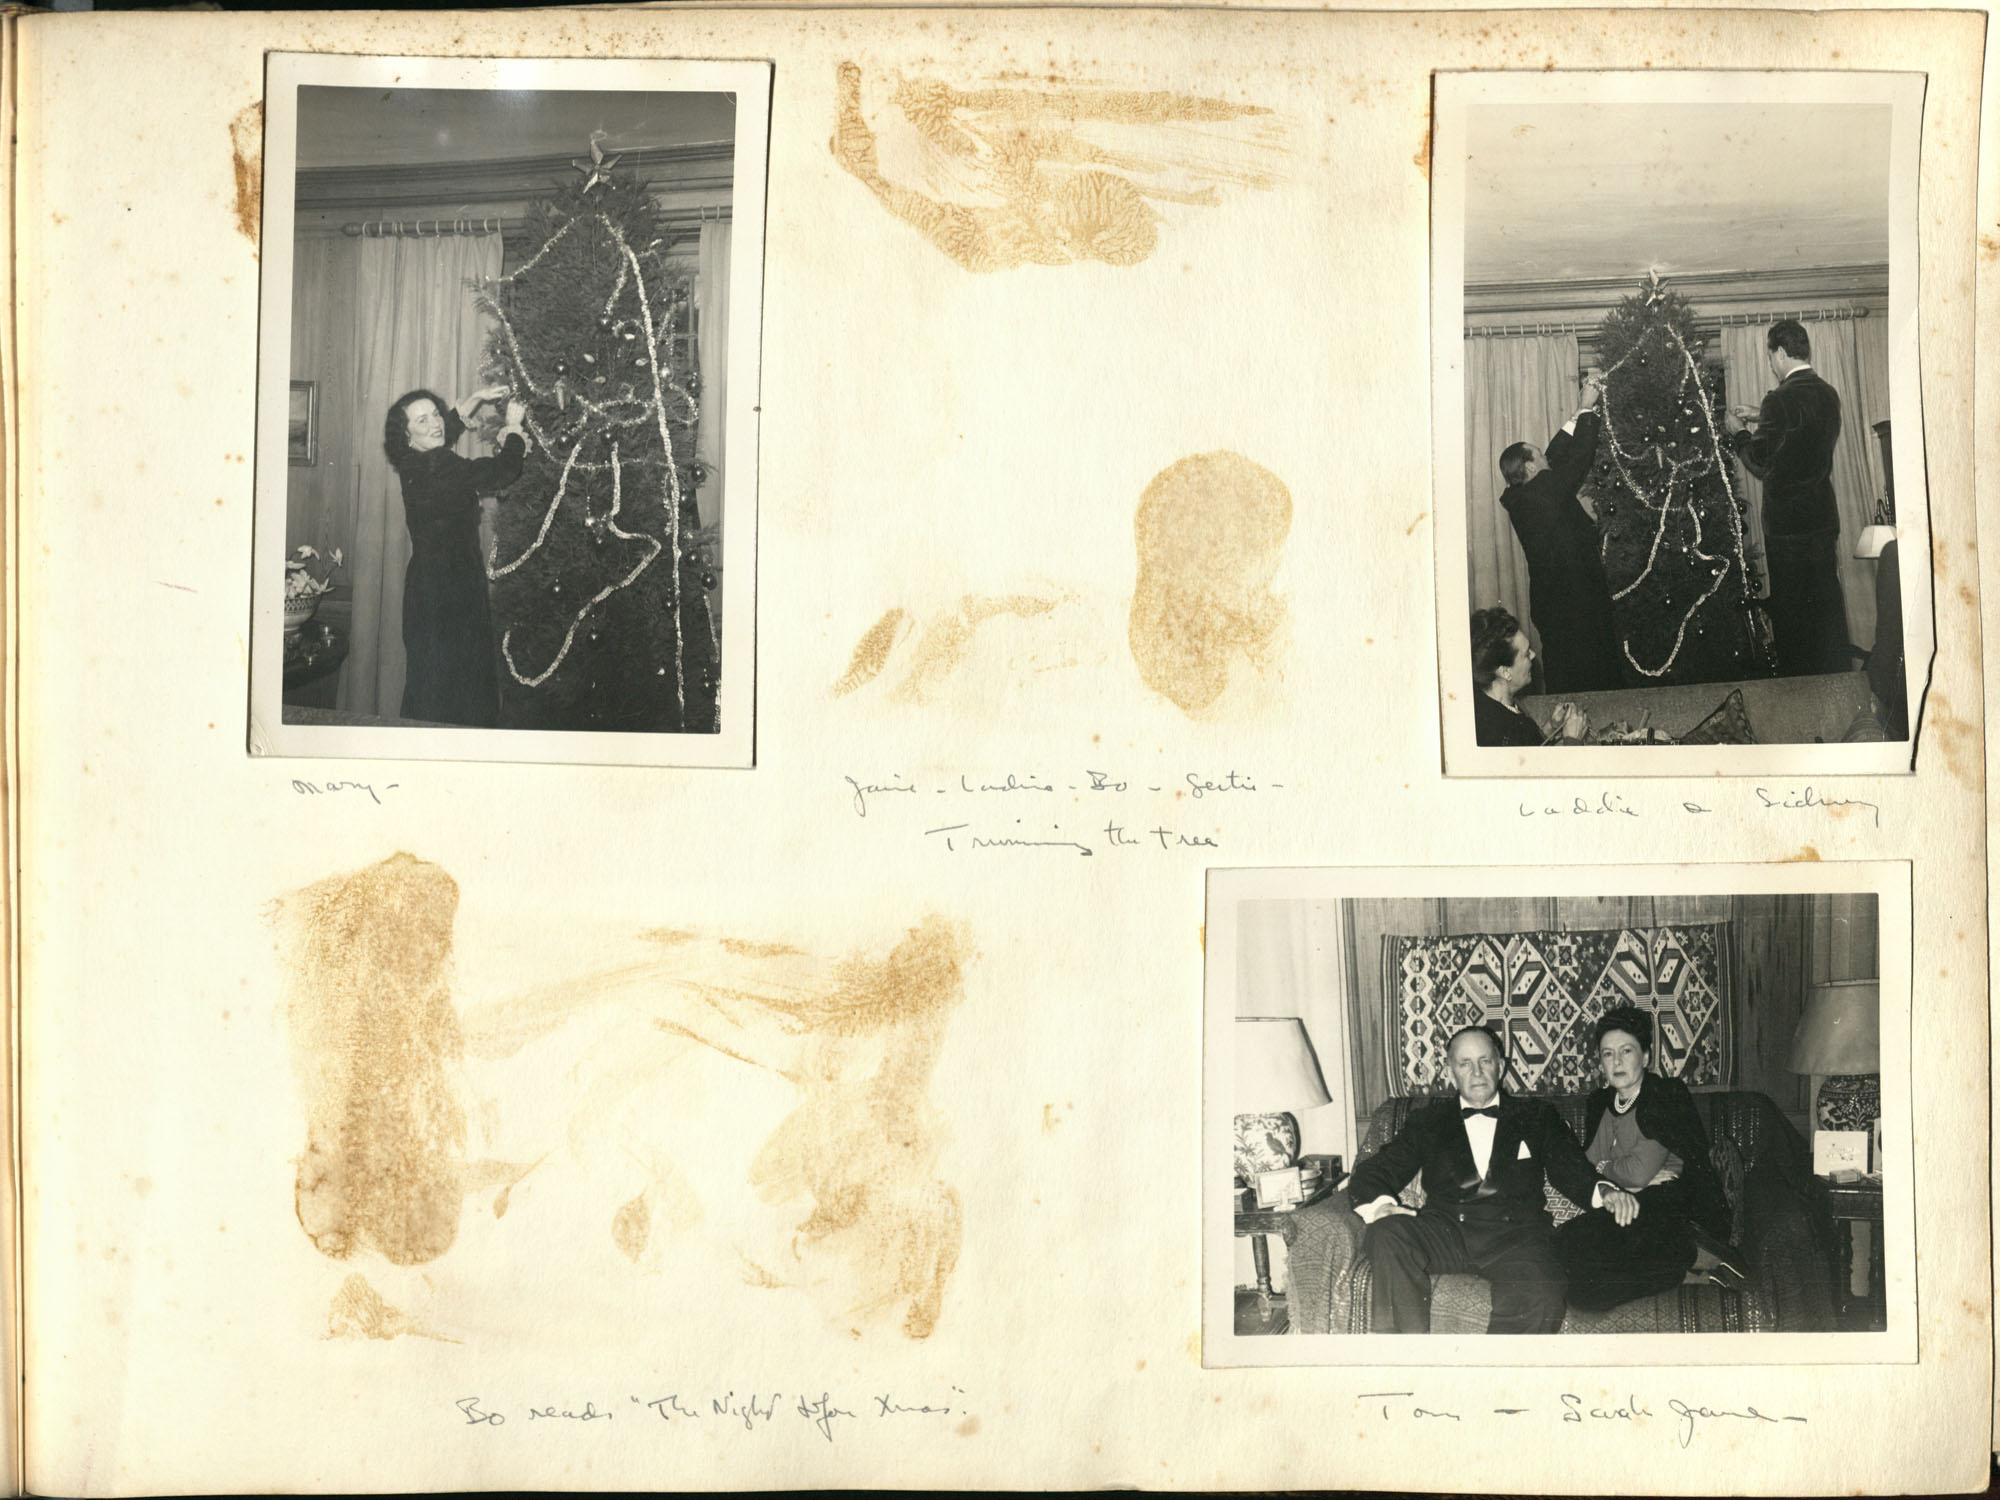 Medway Plantation Photograph Album, 1949, page 123